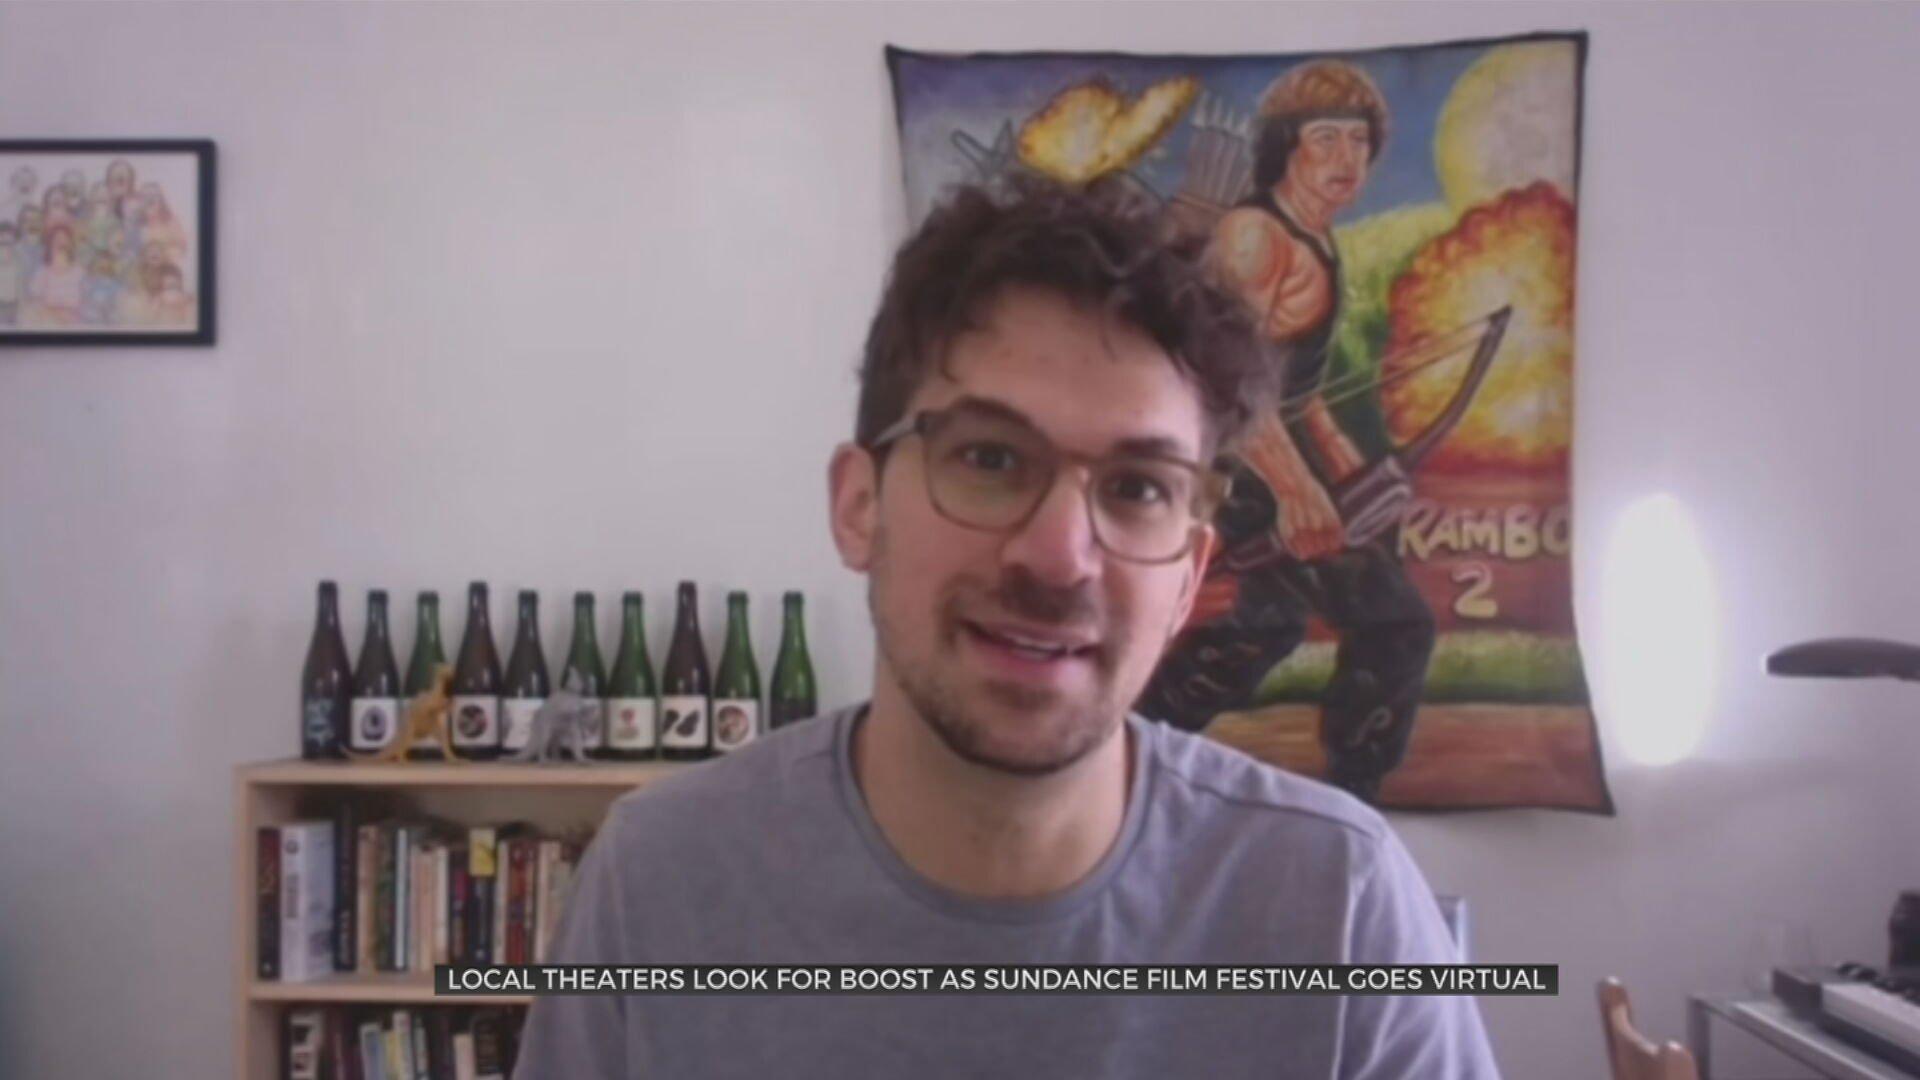 Virtual Sundance Film Festival Screens At Tulsa Theaters, Features Tulsa Filmmaker